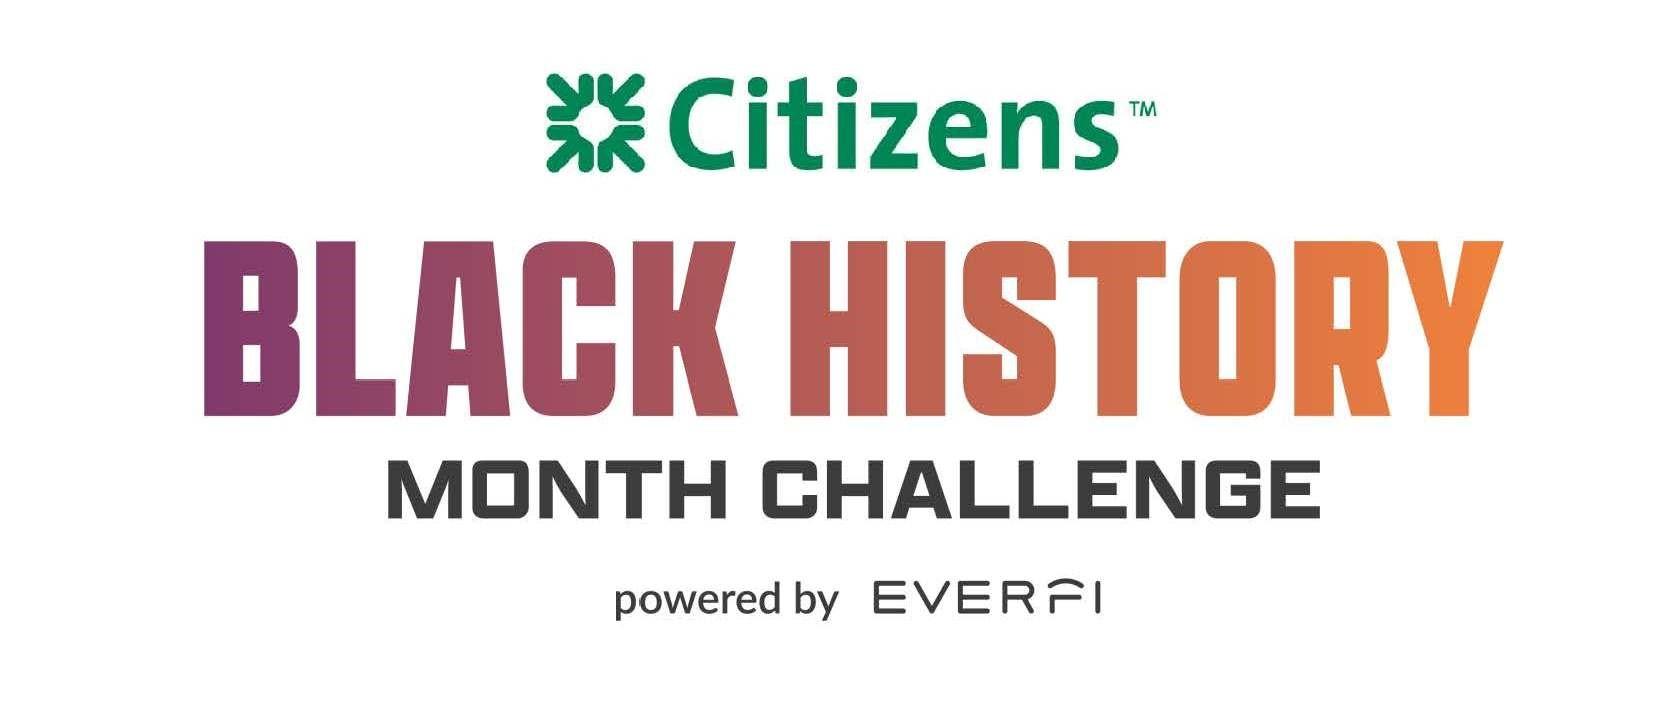 Citizens Black History Month Challenge